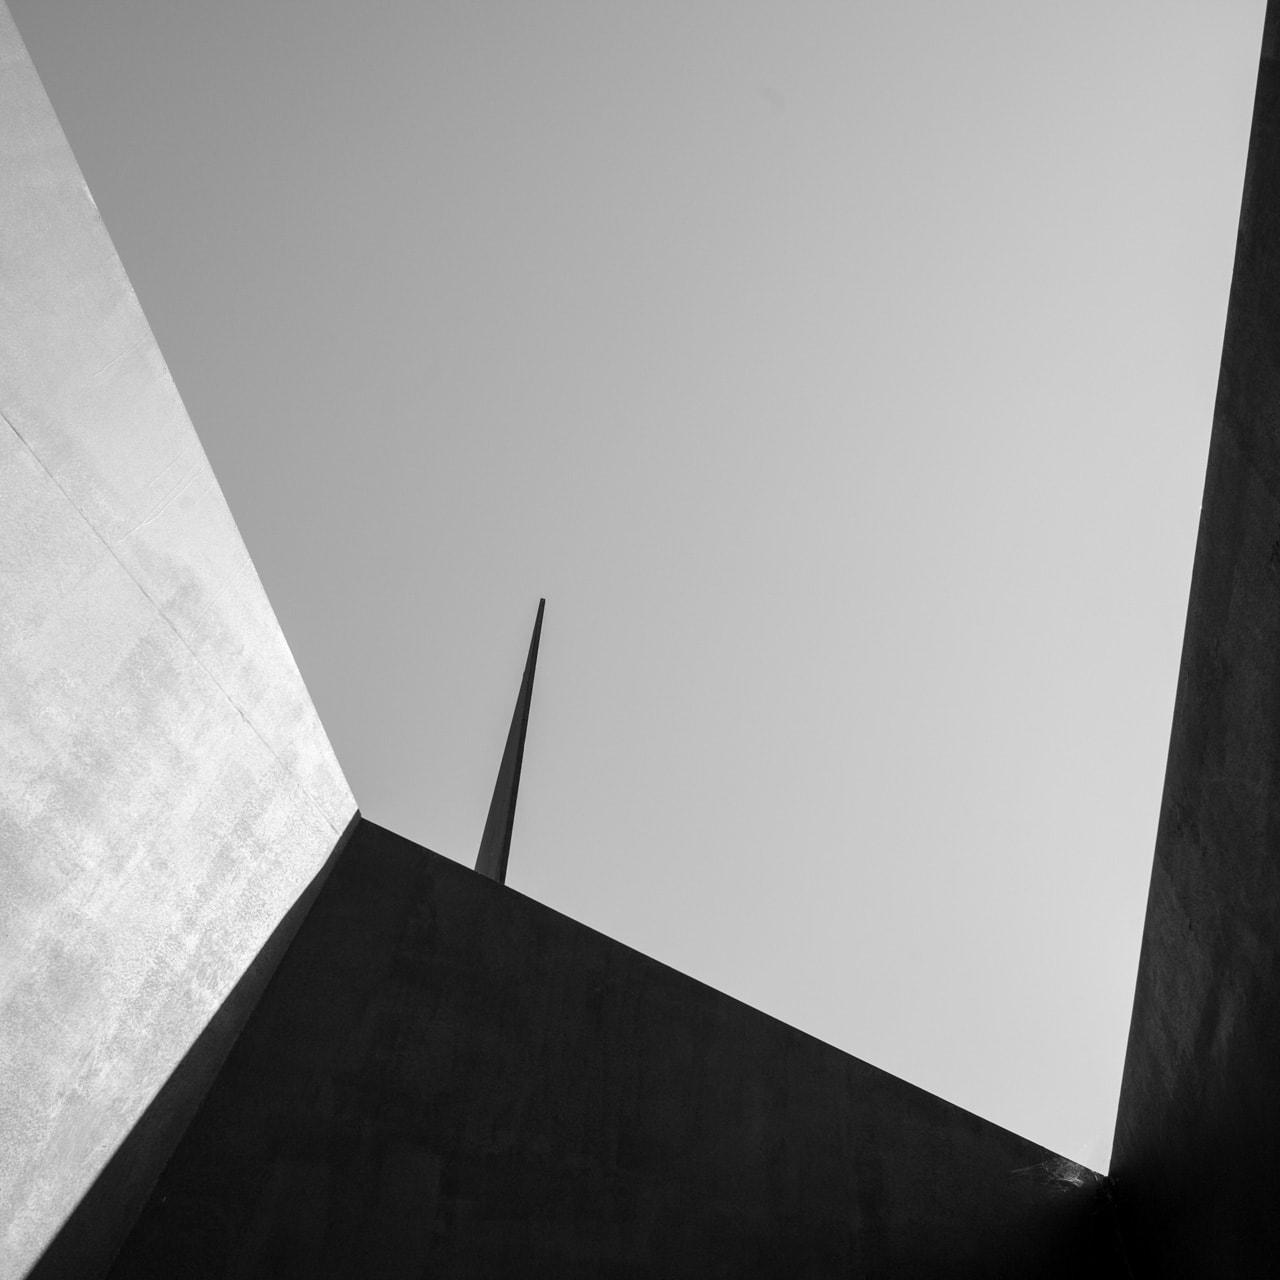 detalle arquitectura abstracto barcelona